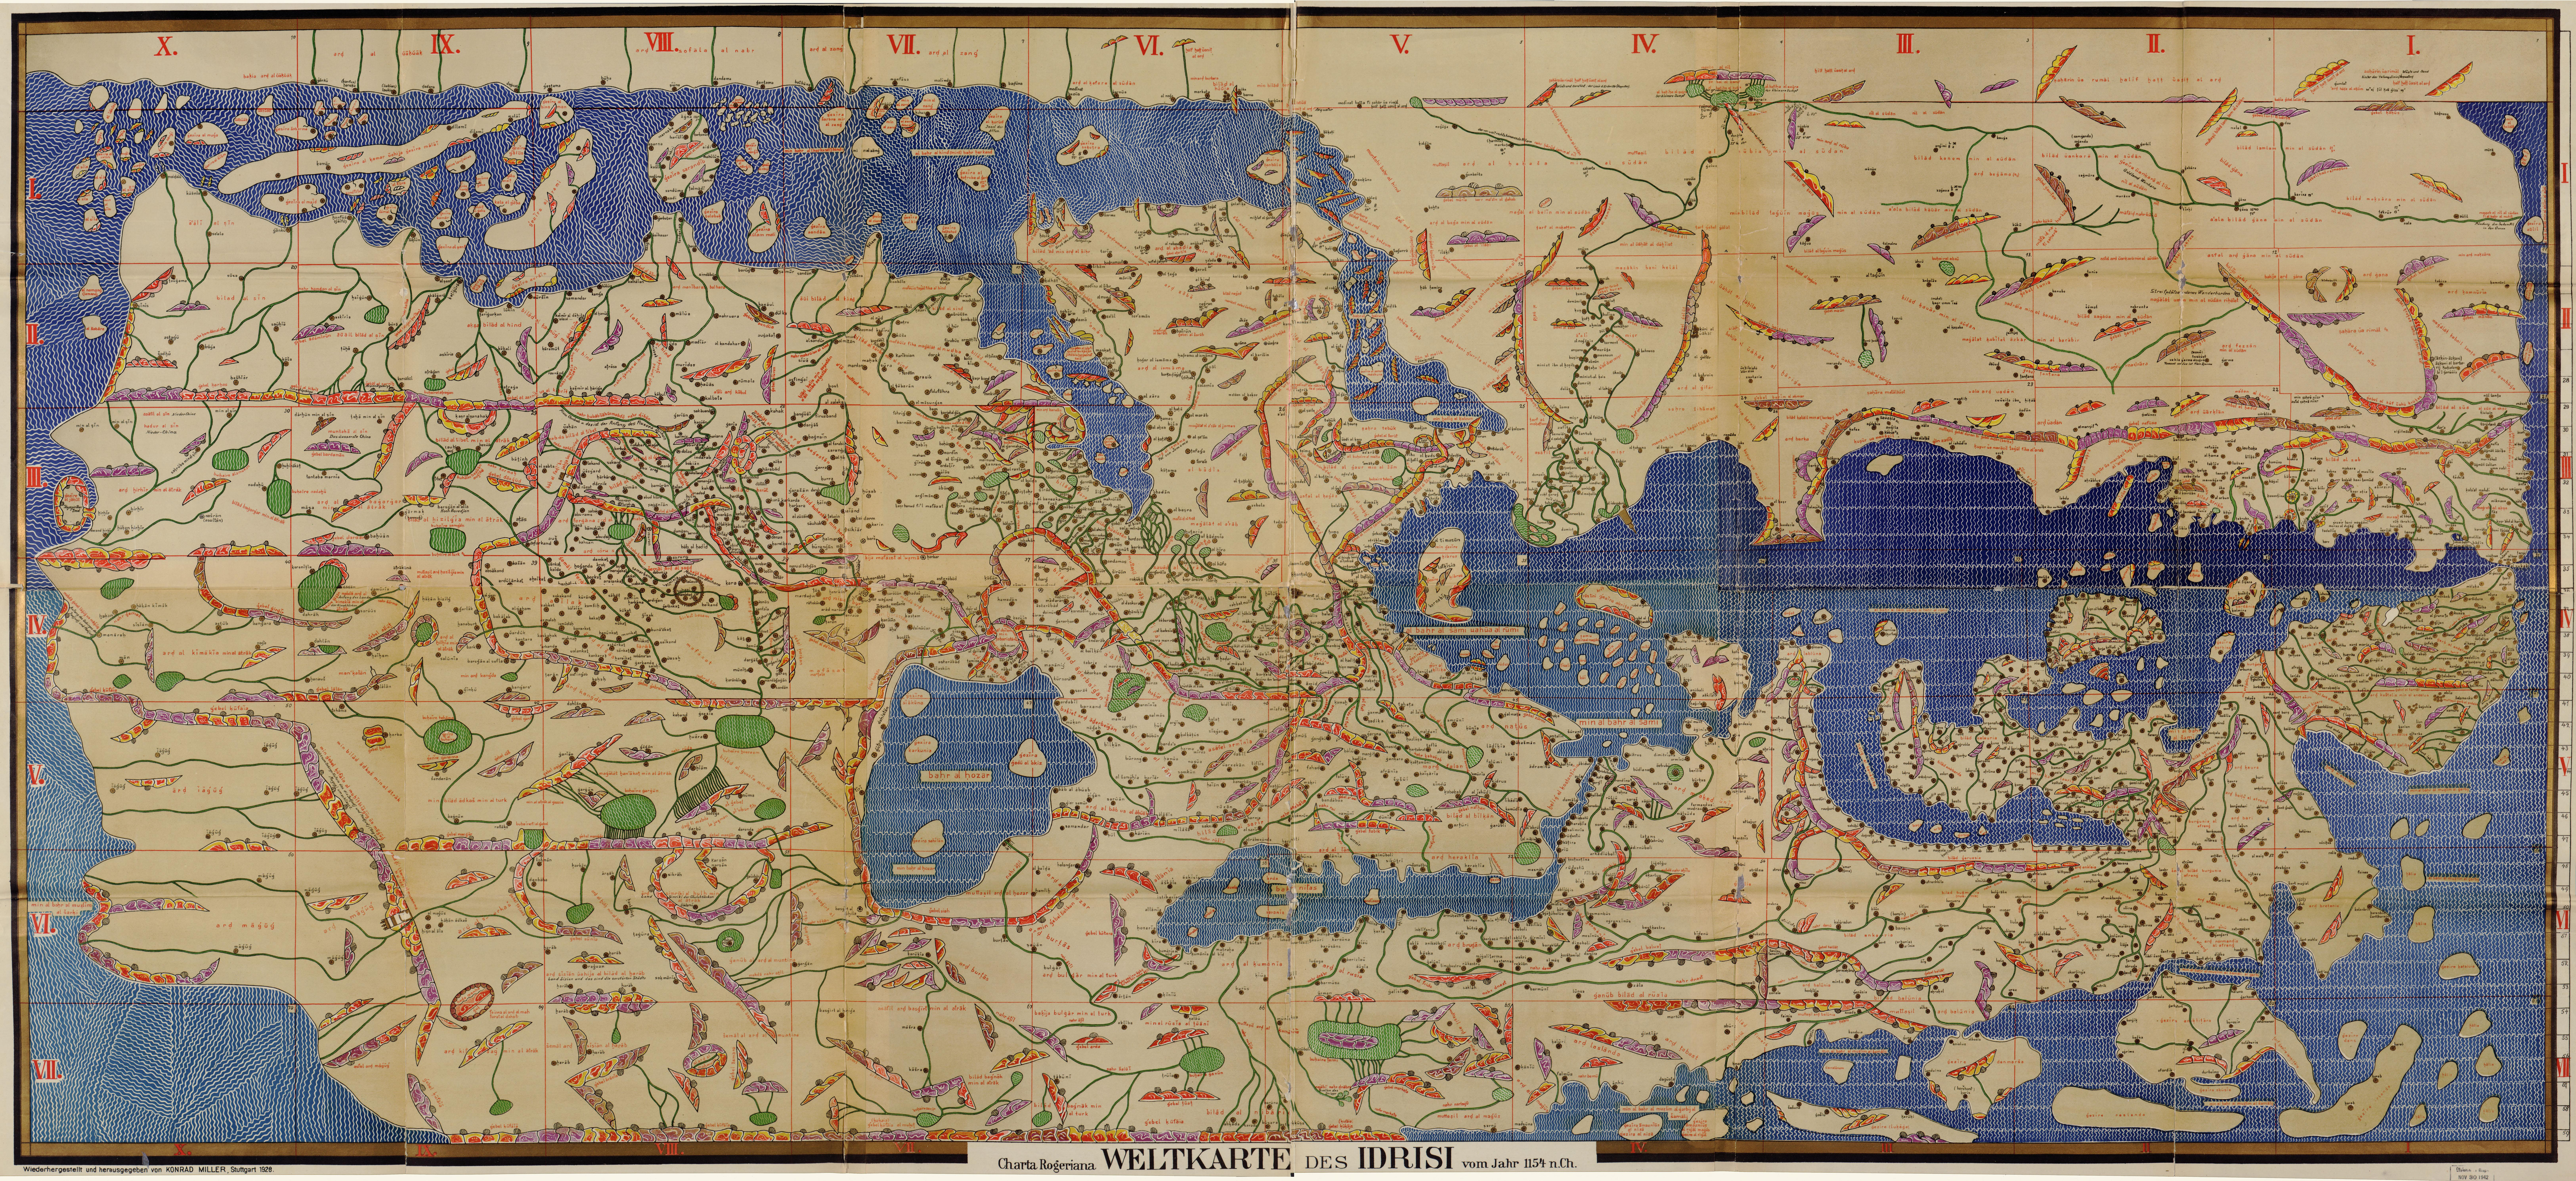 Image of al-Idrisi's world map